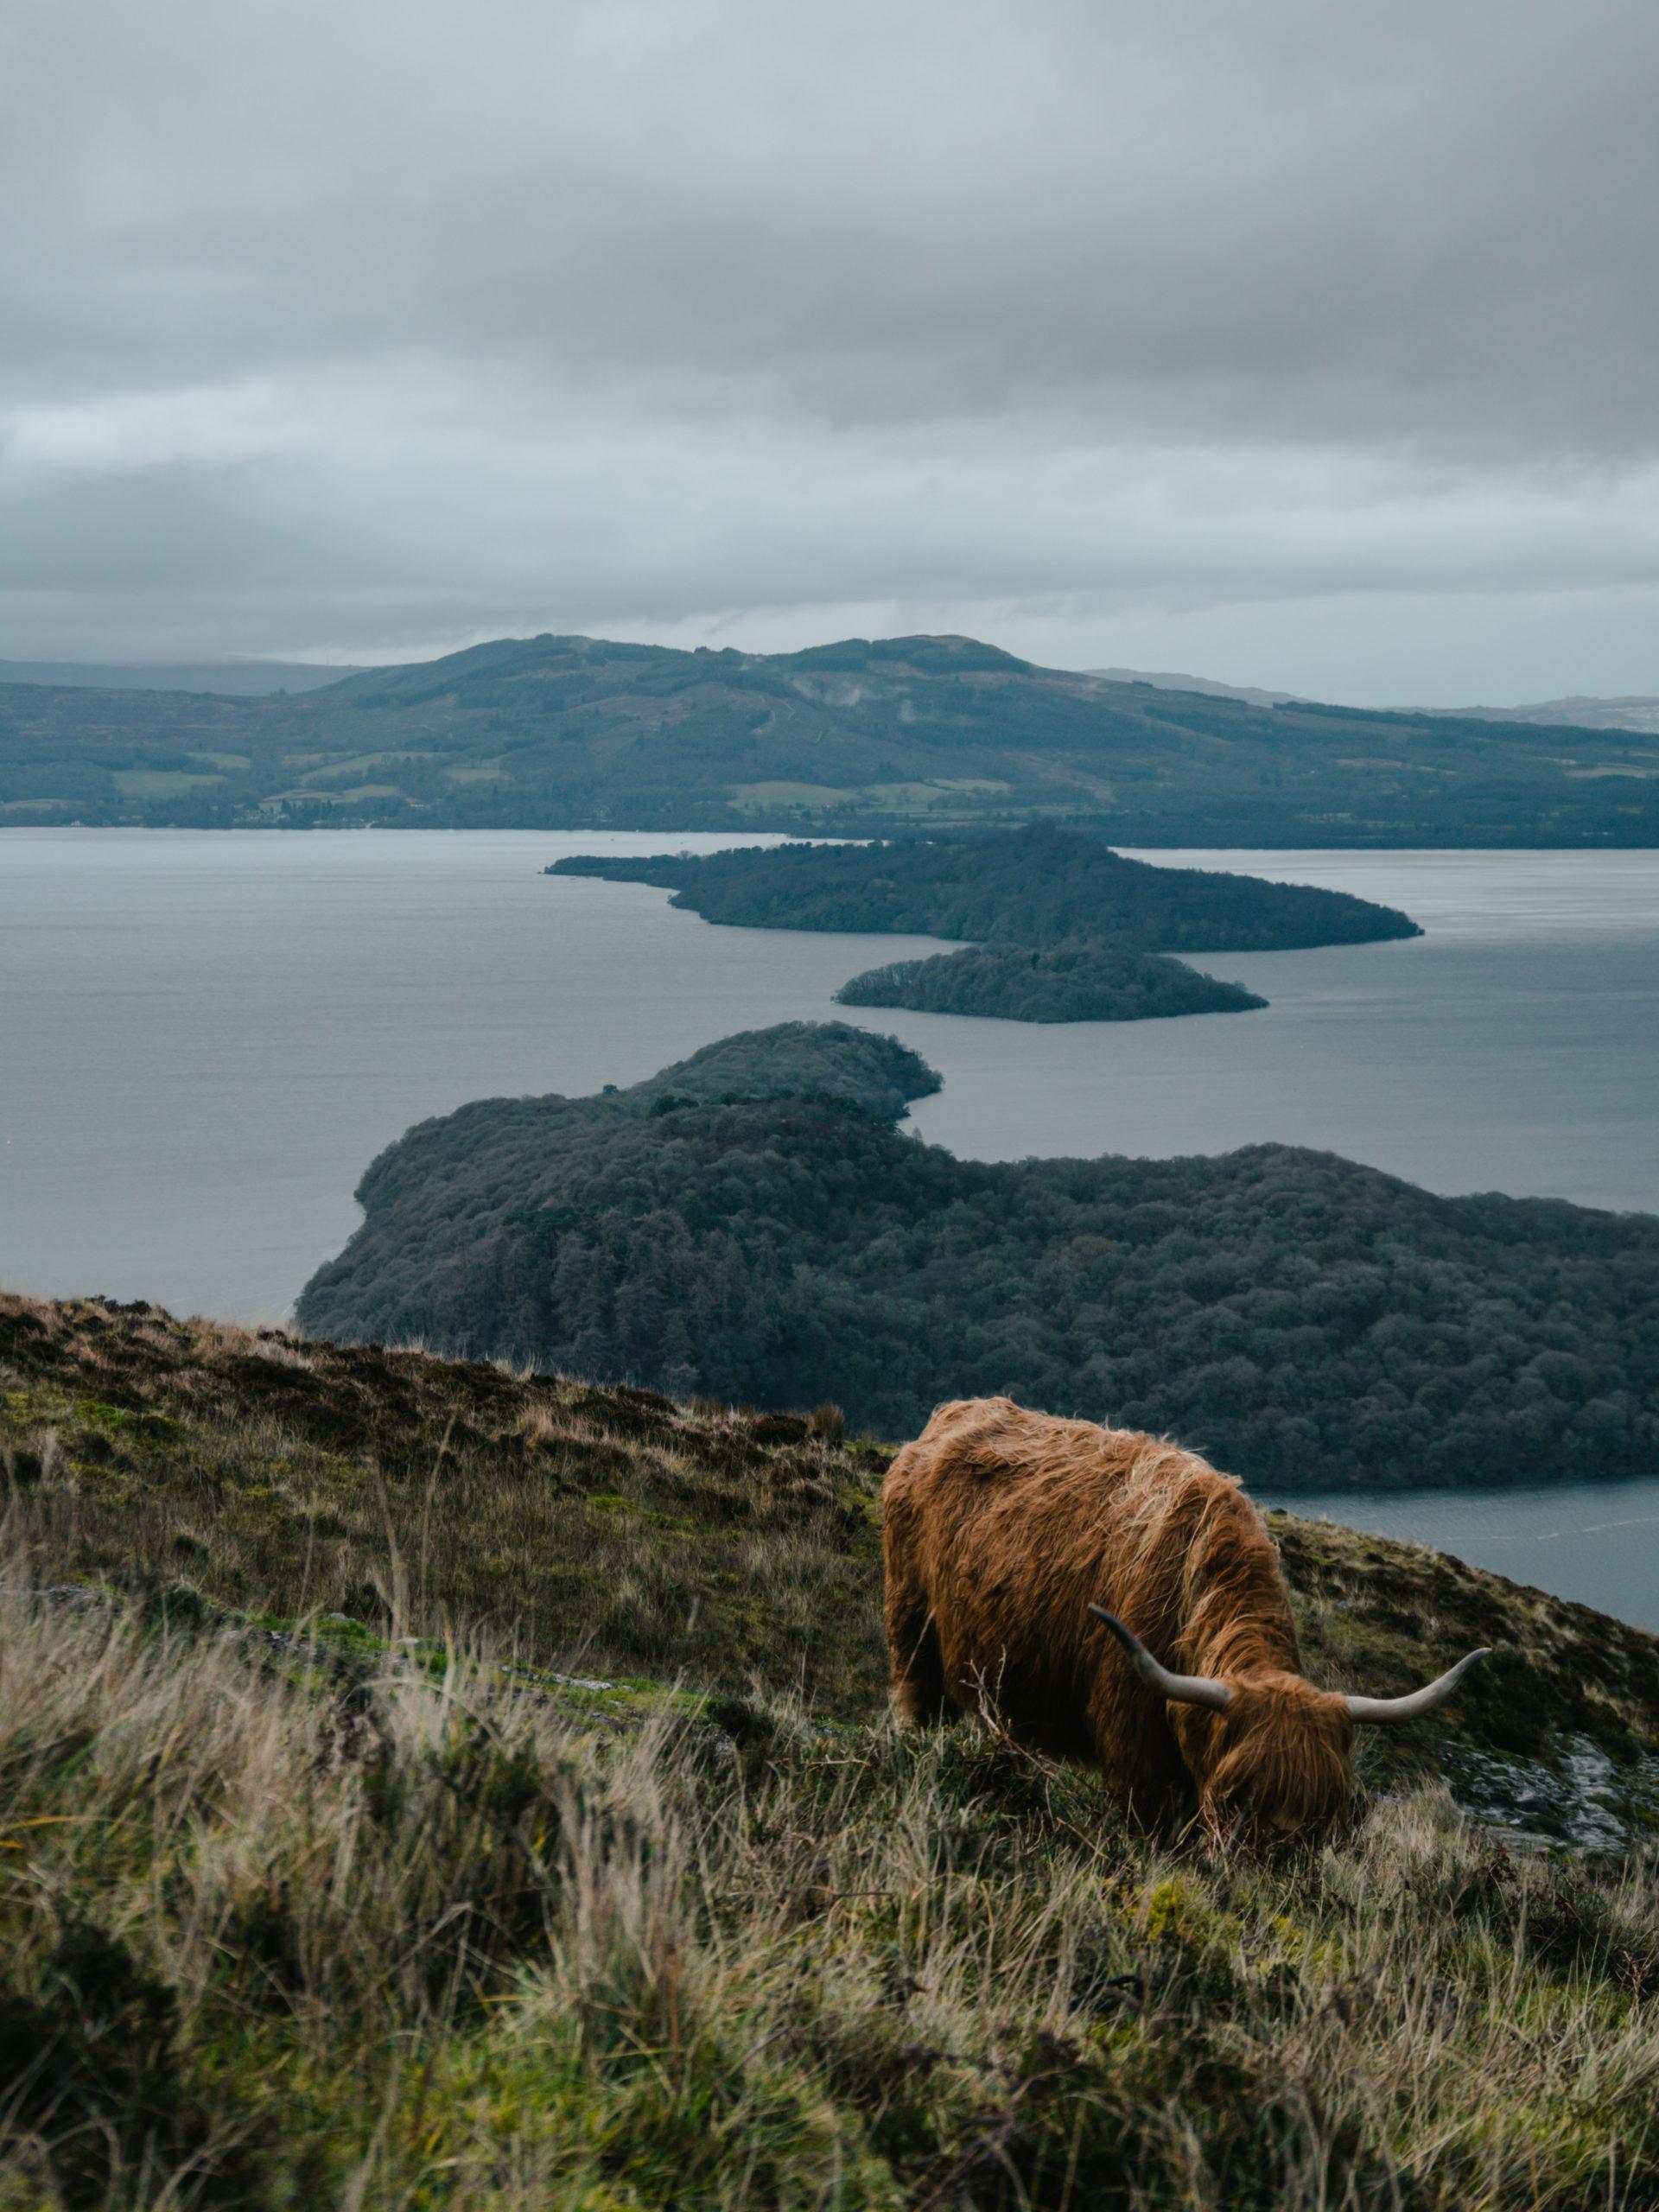 highlands vache écosse randonnée ballade conic hill